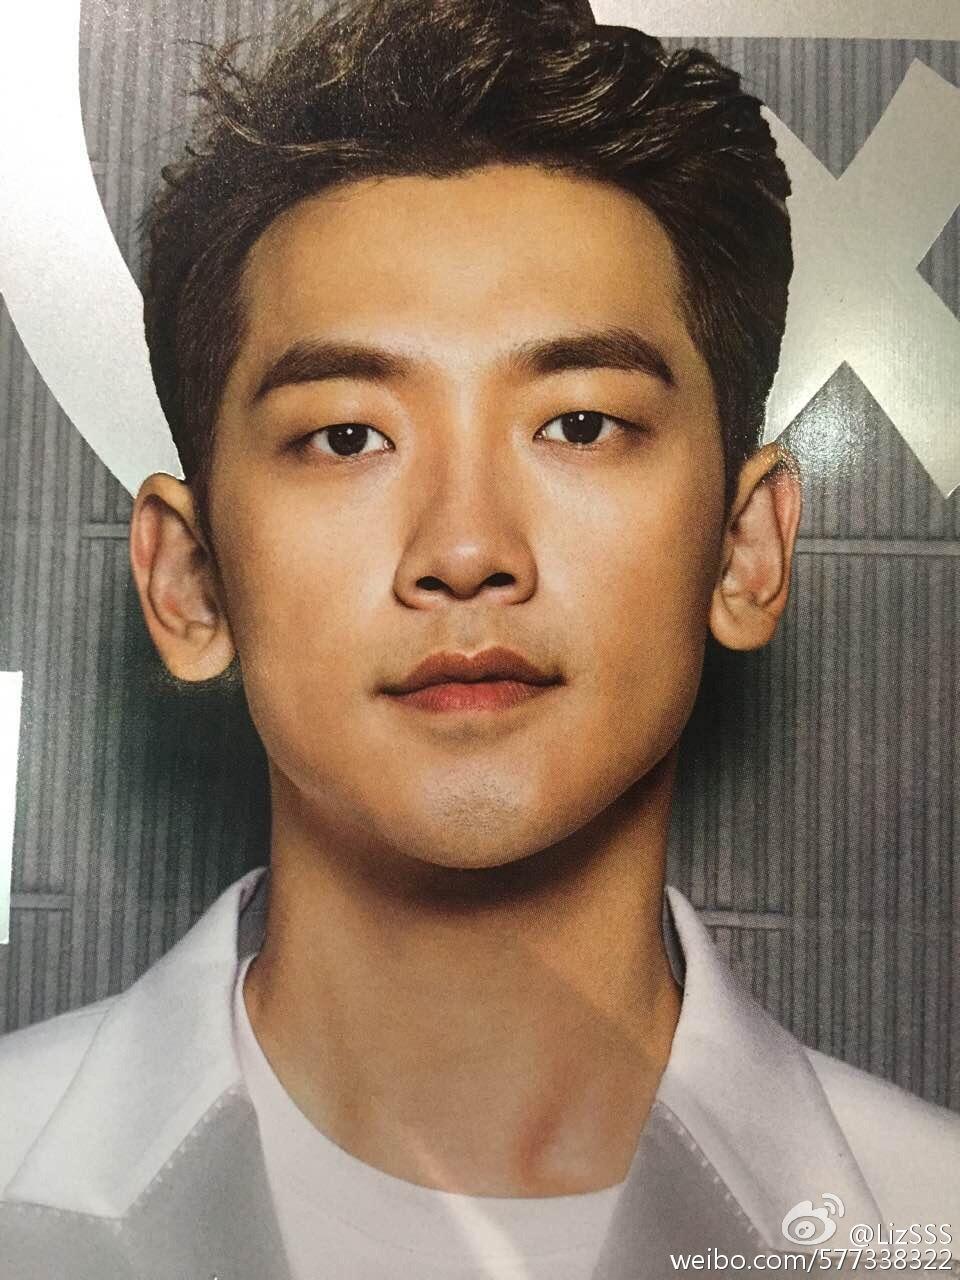 Rain 男人风尚 Leon Magazine _c0047605_7574186.jpg